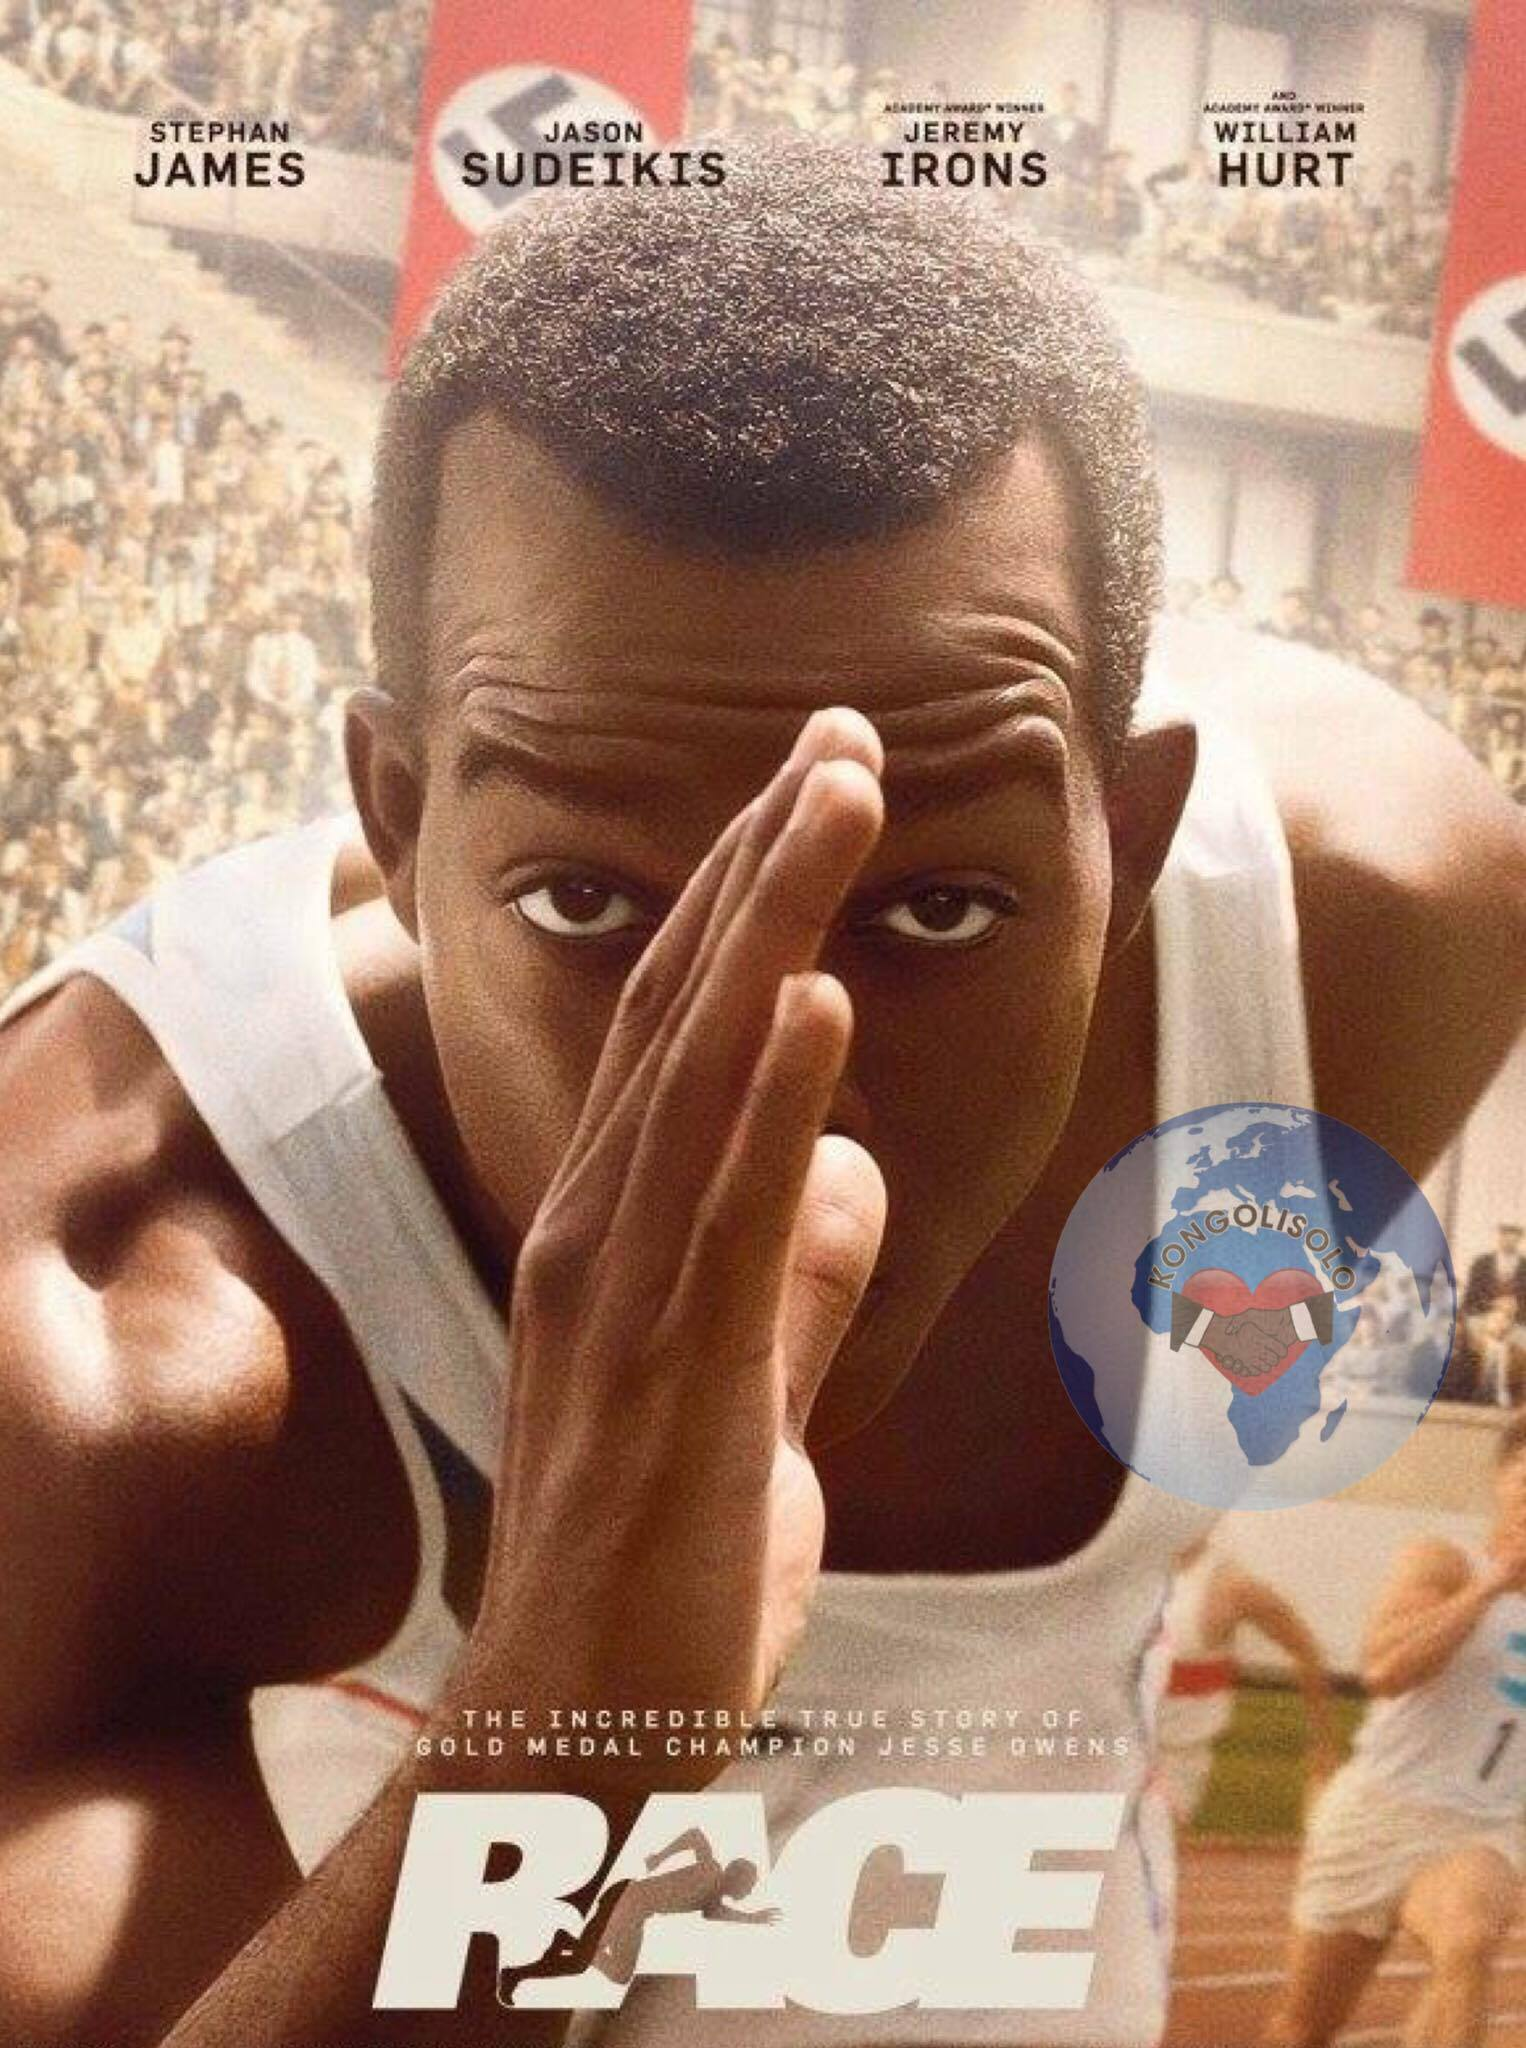 Le 5 août 1936, Jesse Owens